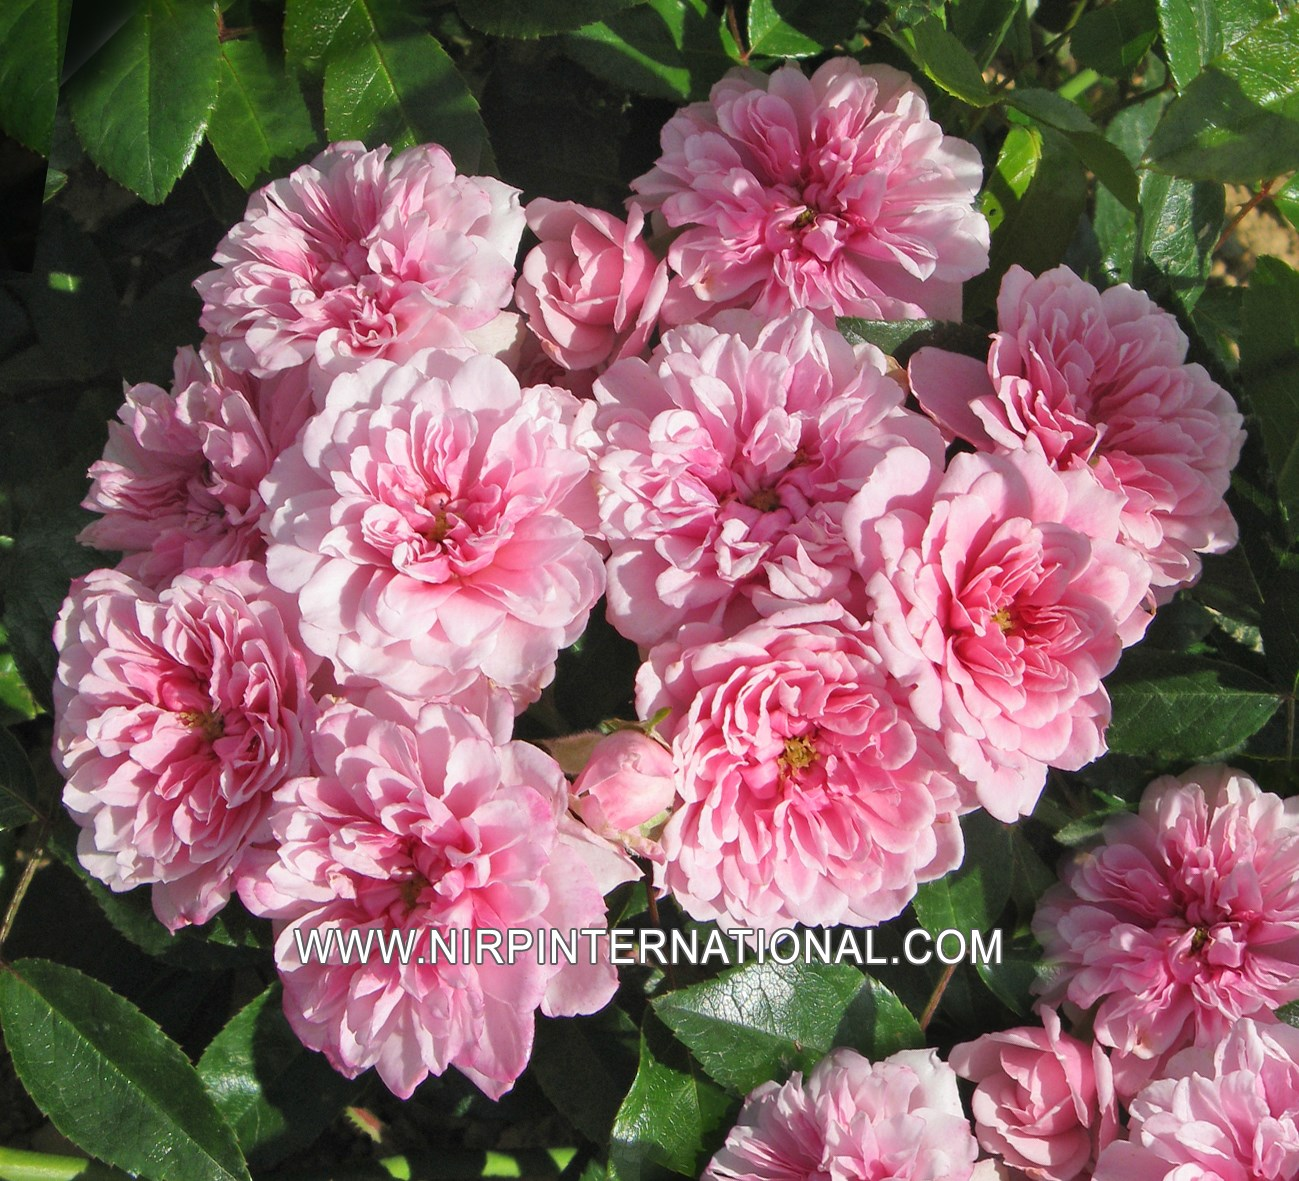 Rose Rampicanti Senza Spine petit bonheur® - nirp